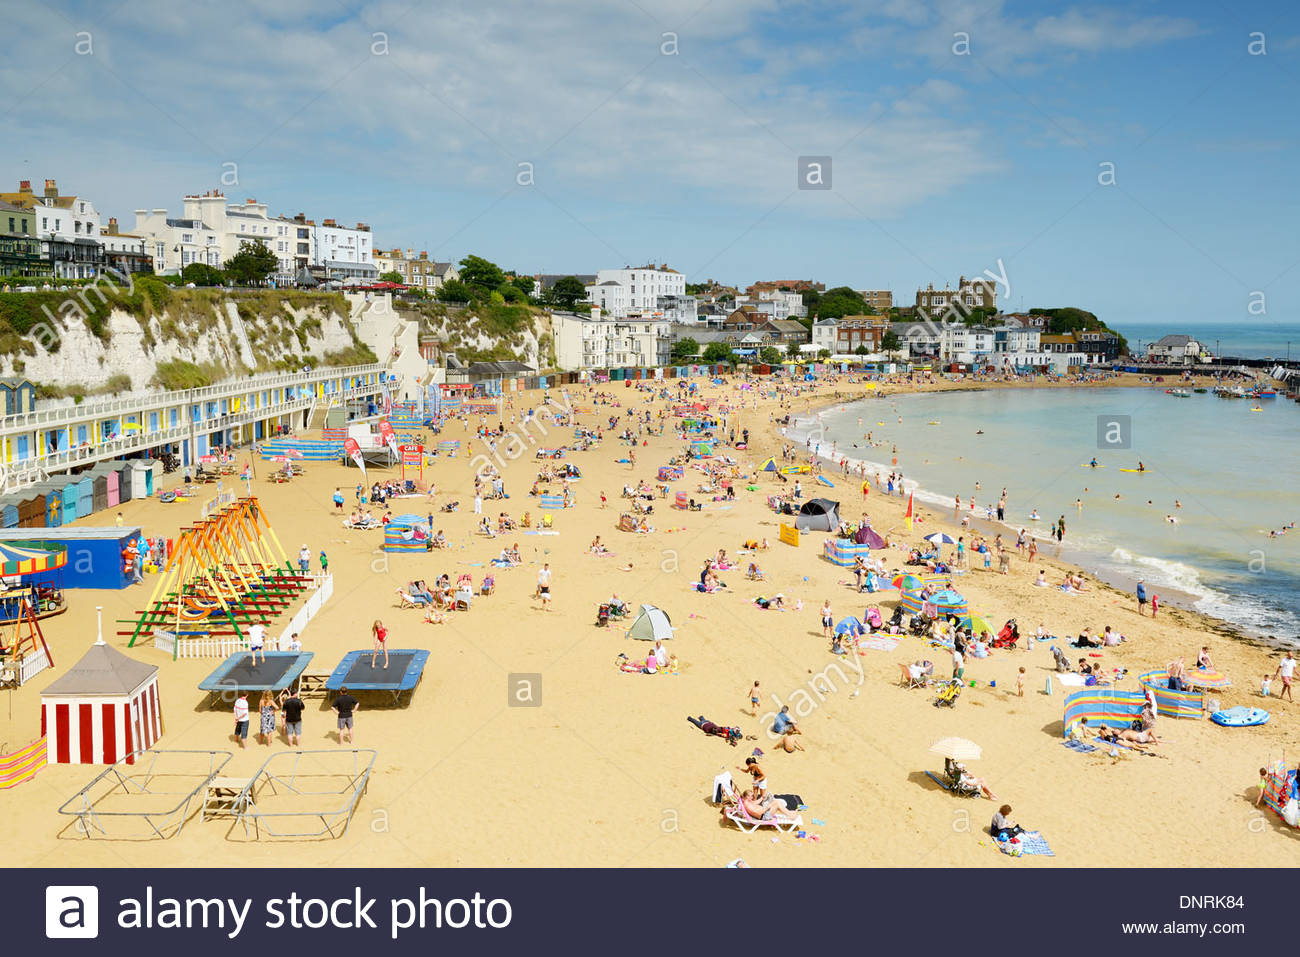 Viking bay beach, Broadstairs, Kent, England UK - Stock Image